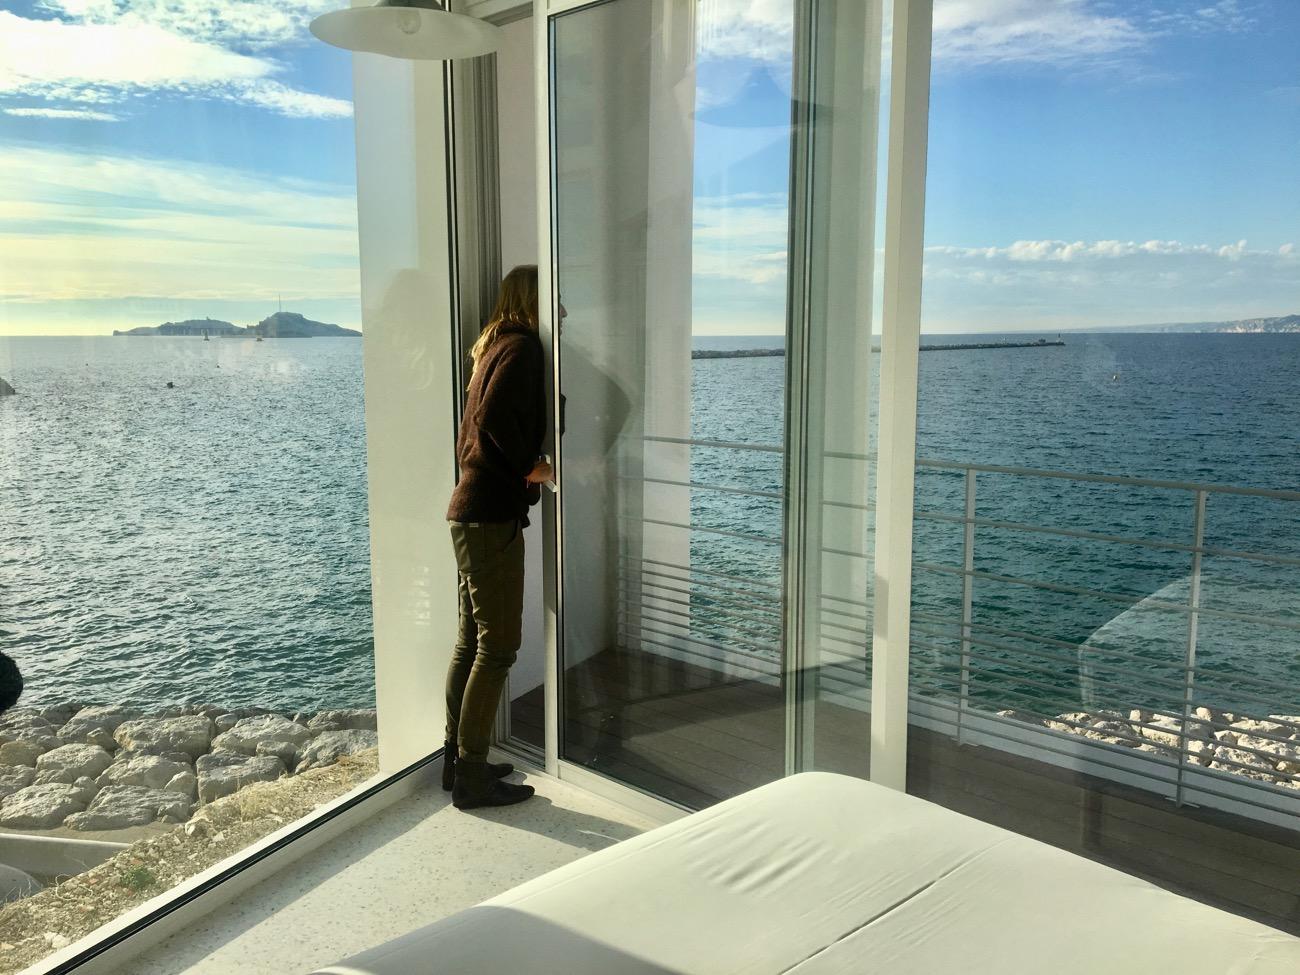 Image Bord De Mer hotel and restaurant marseille - les bords de mer - love spots